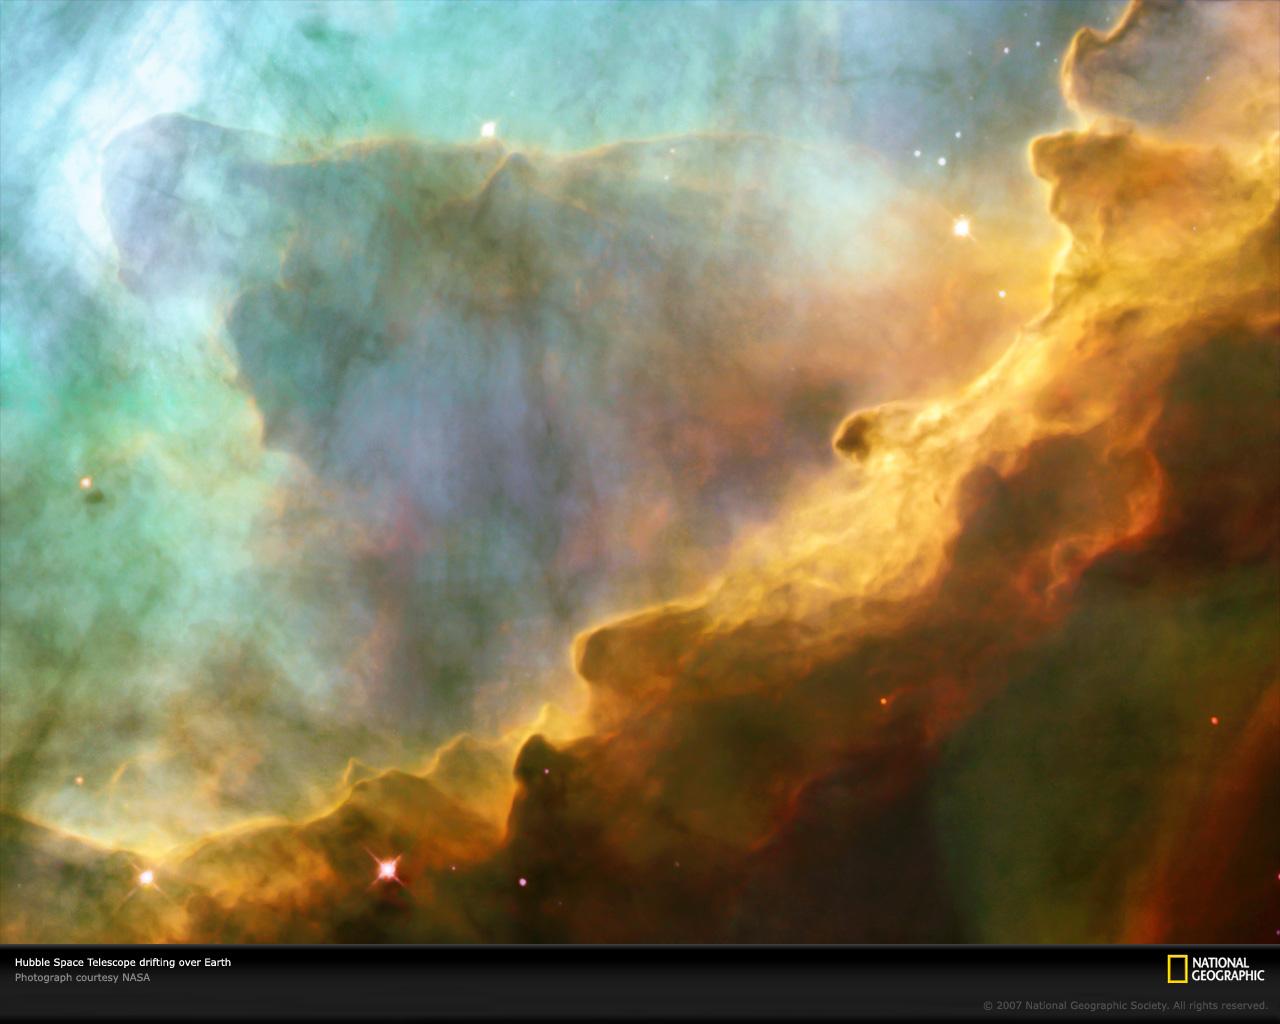 http://4.bp.blogspot.com/_gfXupHOEhH0/TT1yOxRINyI/AAAAAAAATh0/uVViTiwu0N4/s1600/hubble-space-telescope-1.jpg